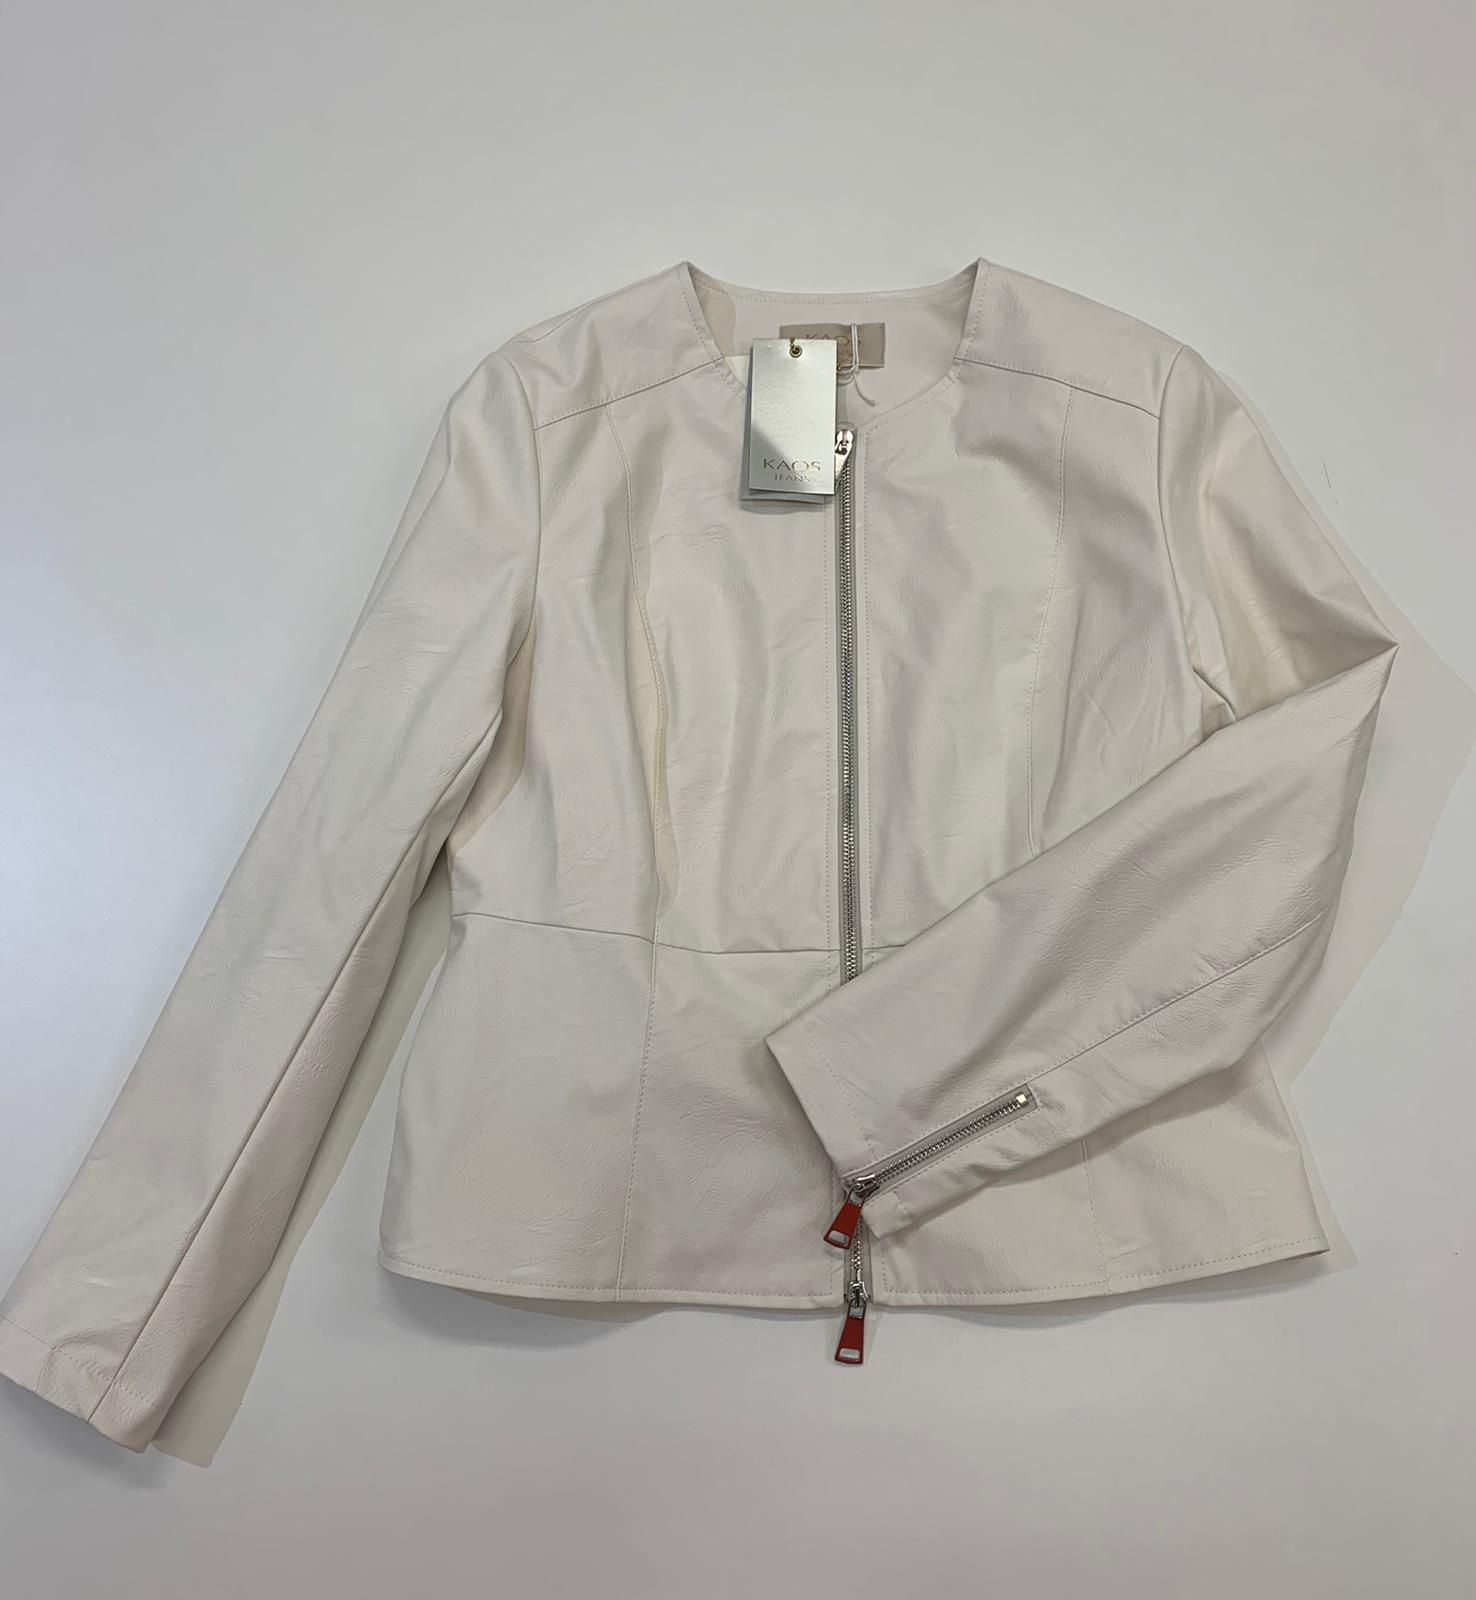 Giubbino Kaos Jeans Ecopelle Bianco